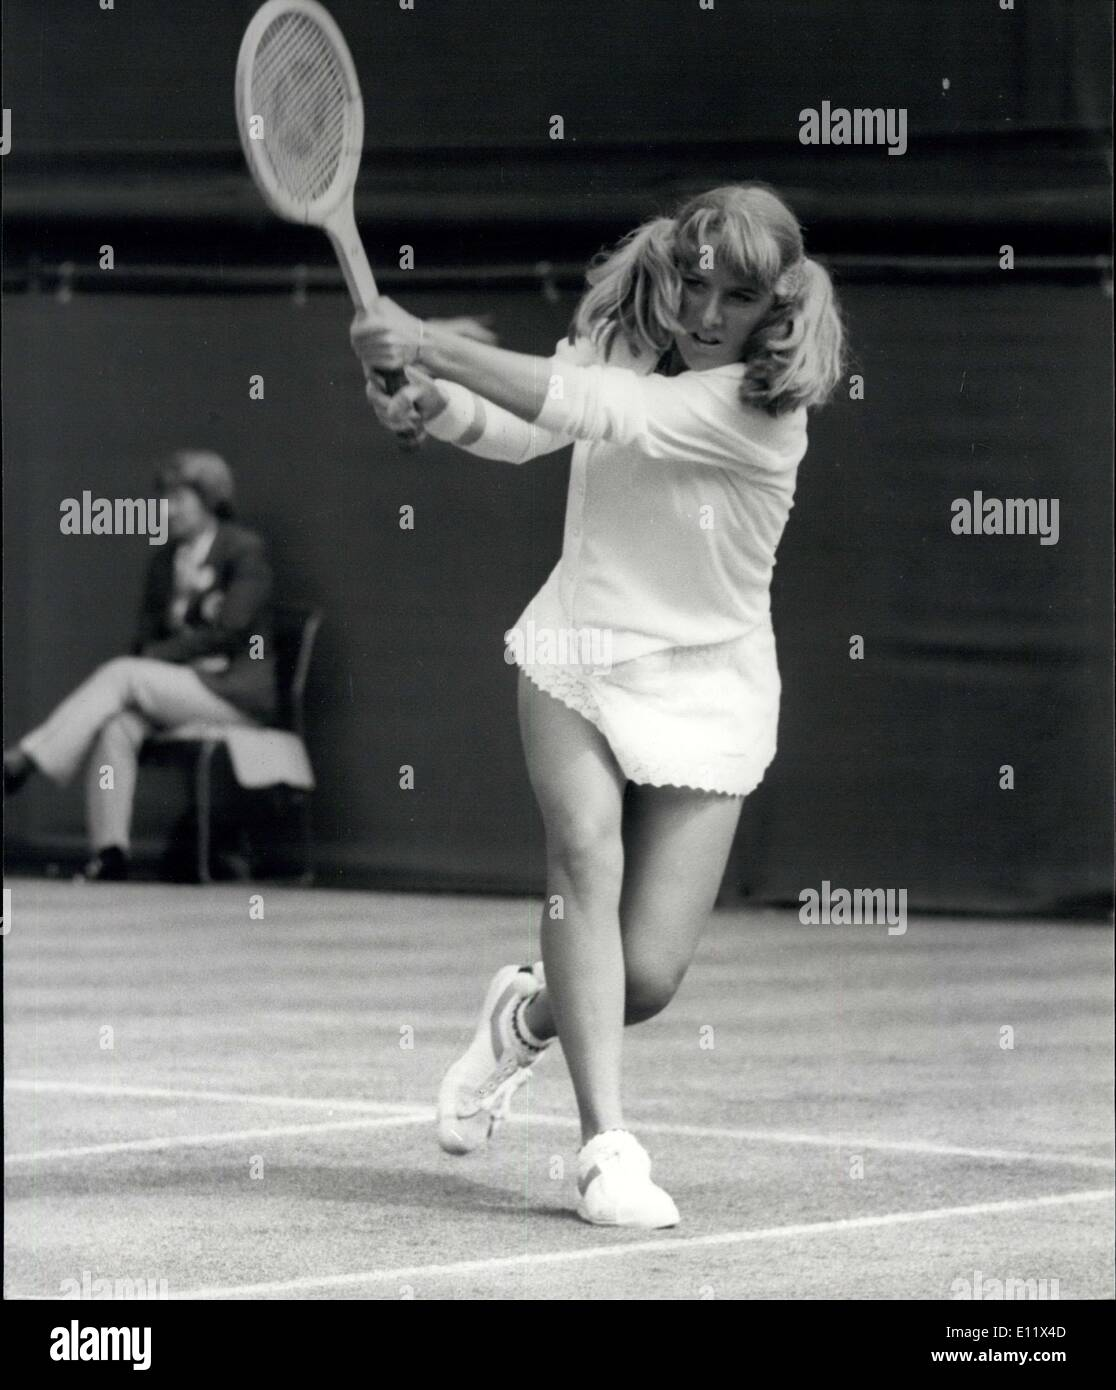 Singles Wimbledon Miss Stock s & Singles Wimbledon Miss Stock